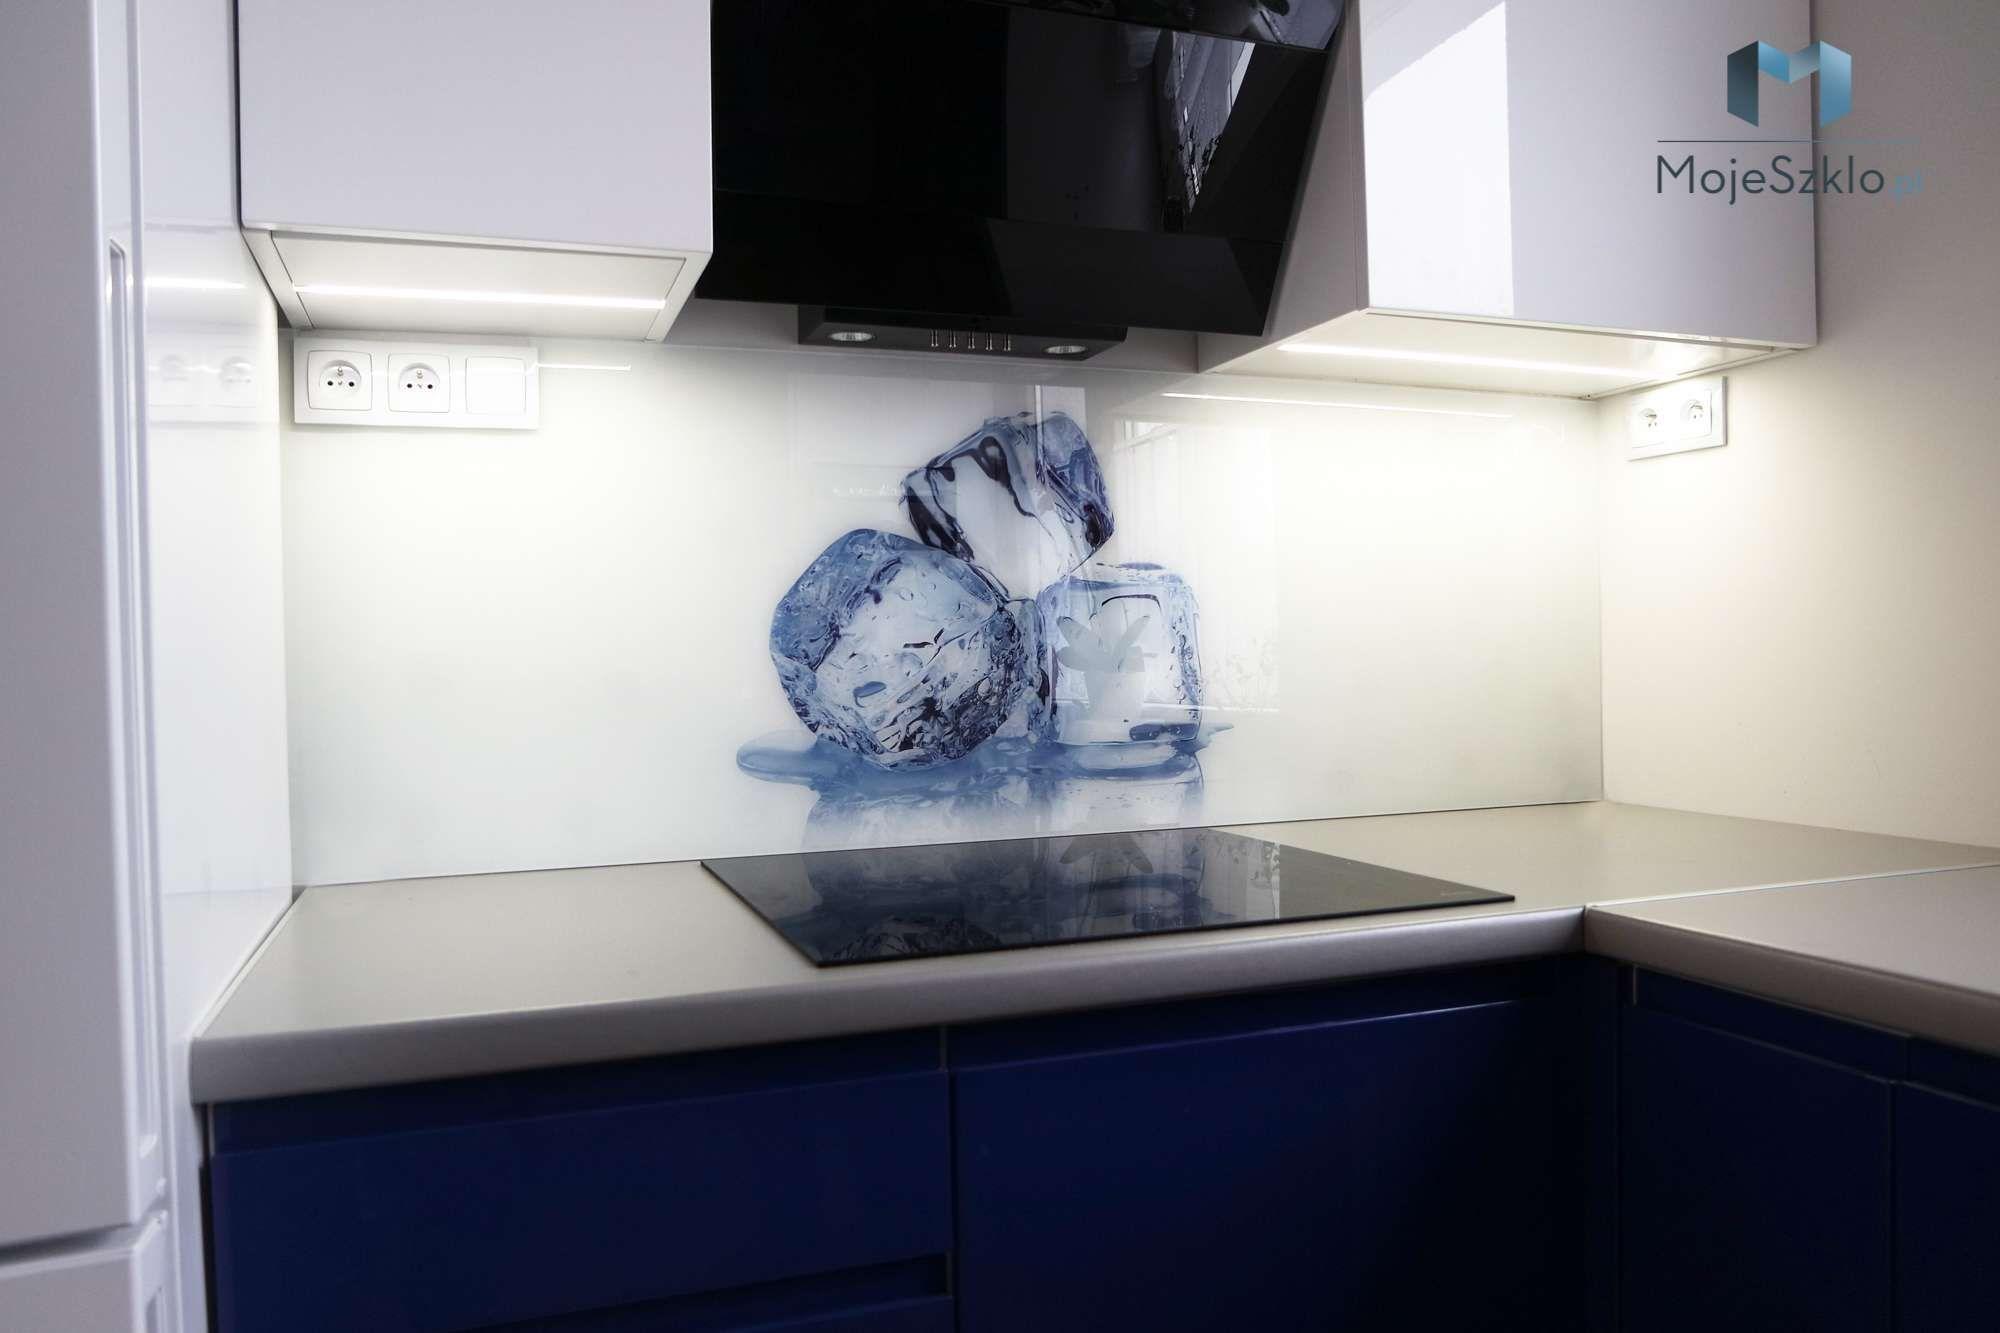 Szklane Panele Kostki Lodu Home Decor Ironing Center Storage